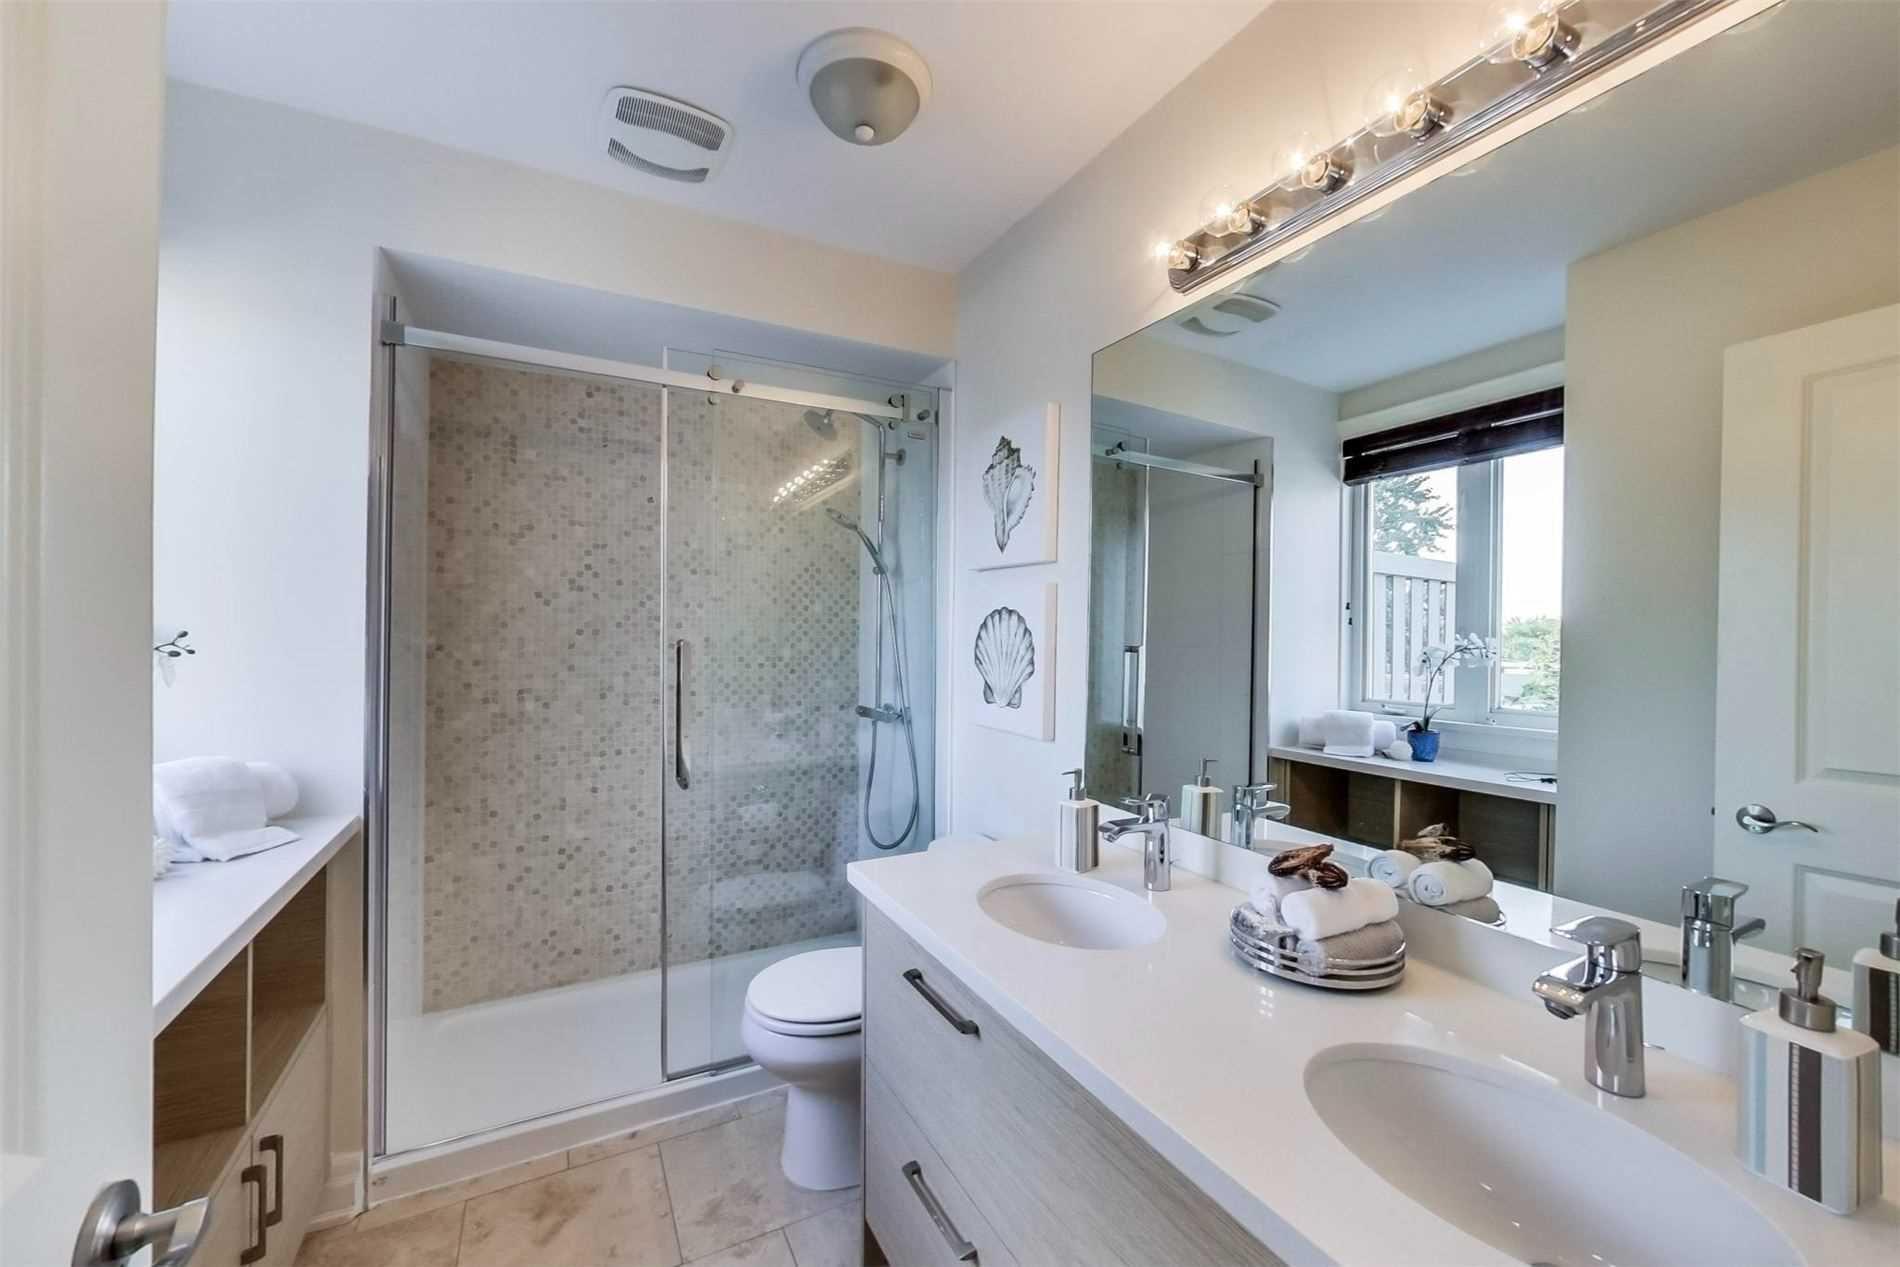 Photo 25: Photos: 213 Heward Avenue in Toronto: South Riverdale House (3-Storey) for sale (Toronto E01)  : MLS®# E4941877